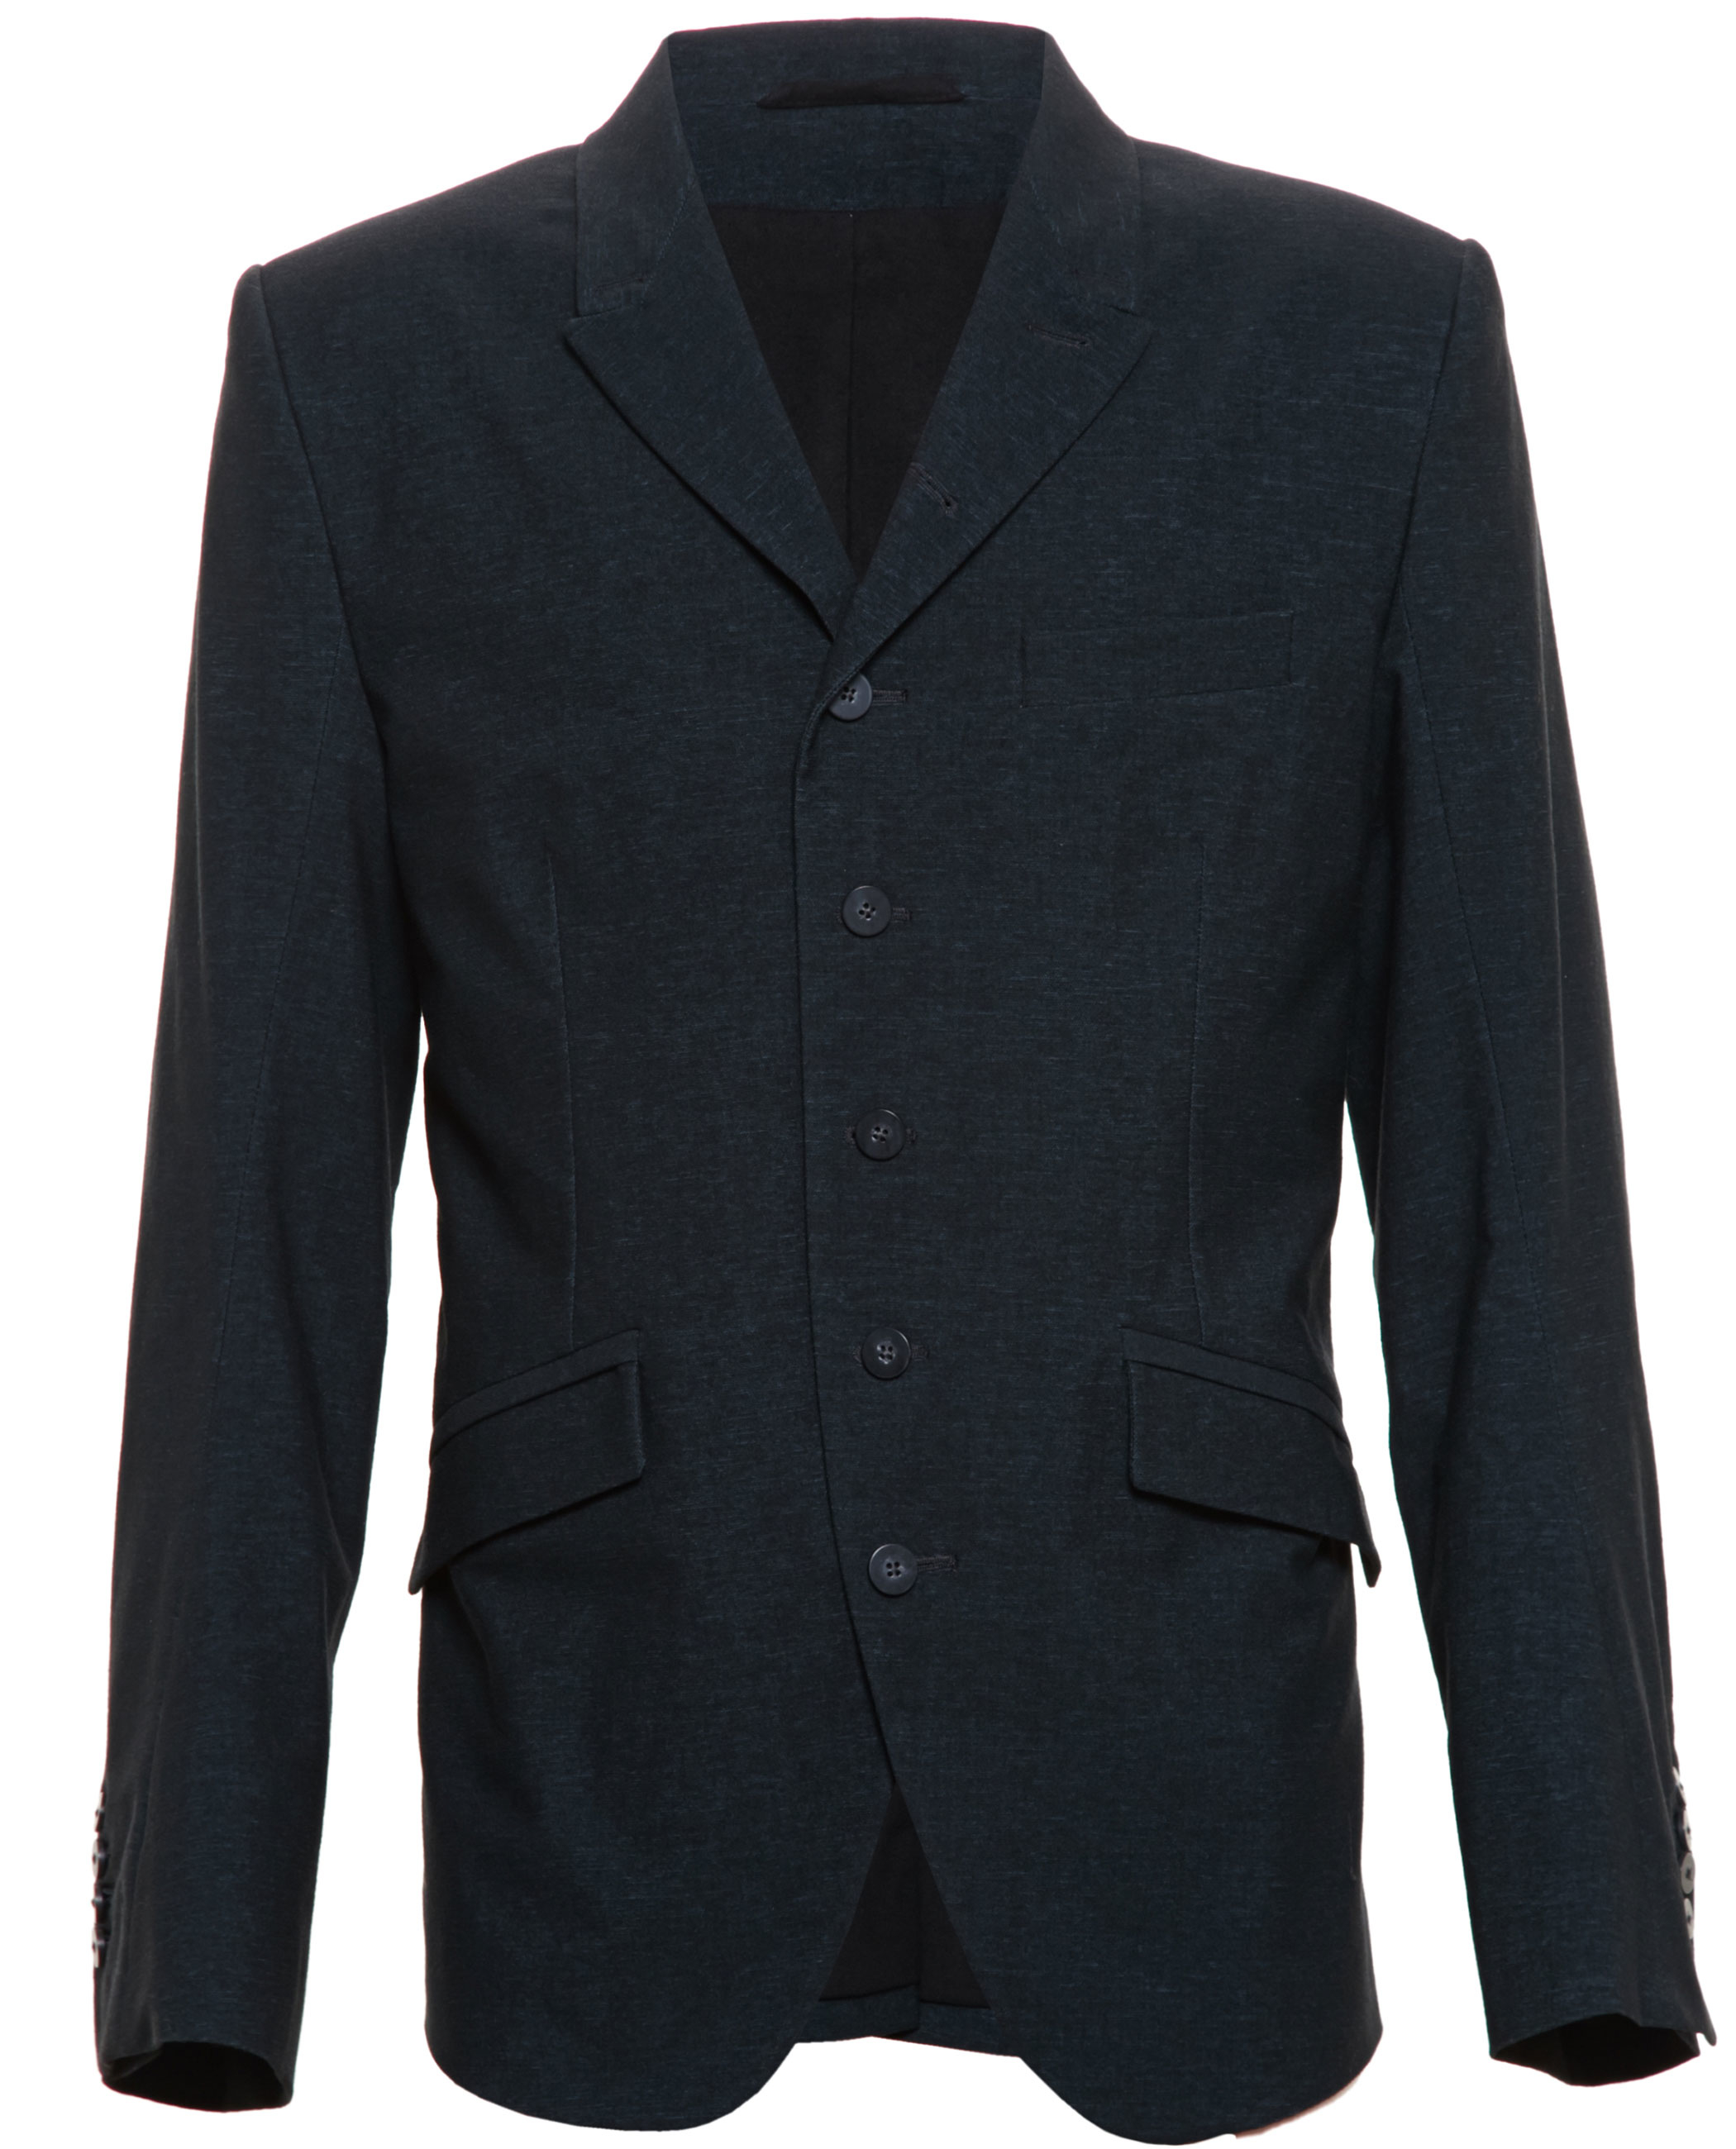 Ann demeulemeester Tailored Wool Jacket in Green for Men | Lyst